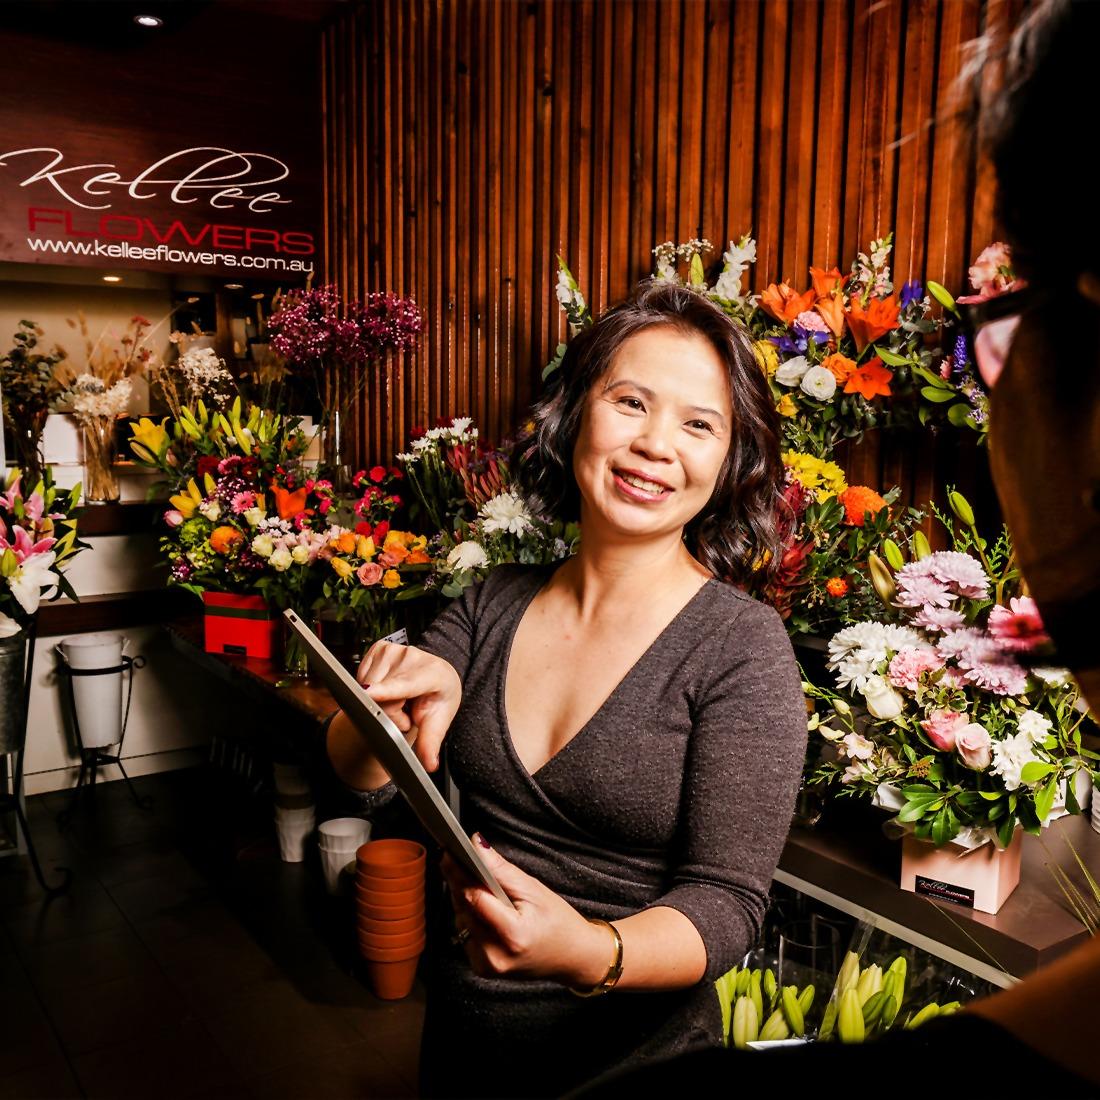 Kellee from Kellee flowers in her flower shop using her tablet, talking to a customer